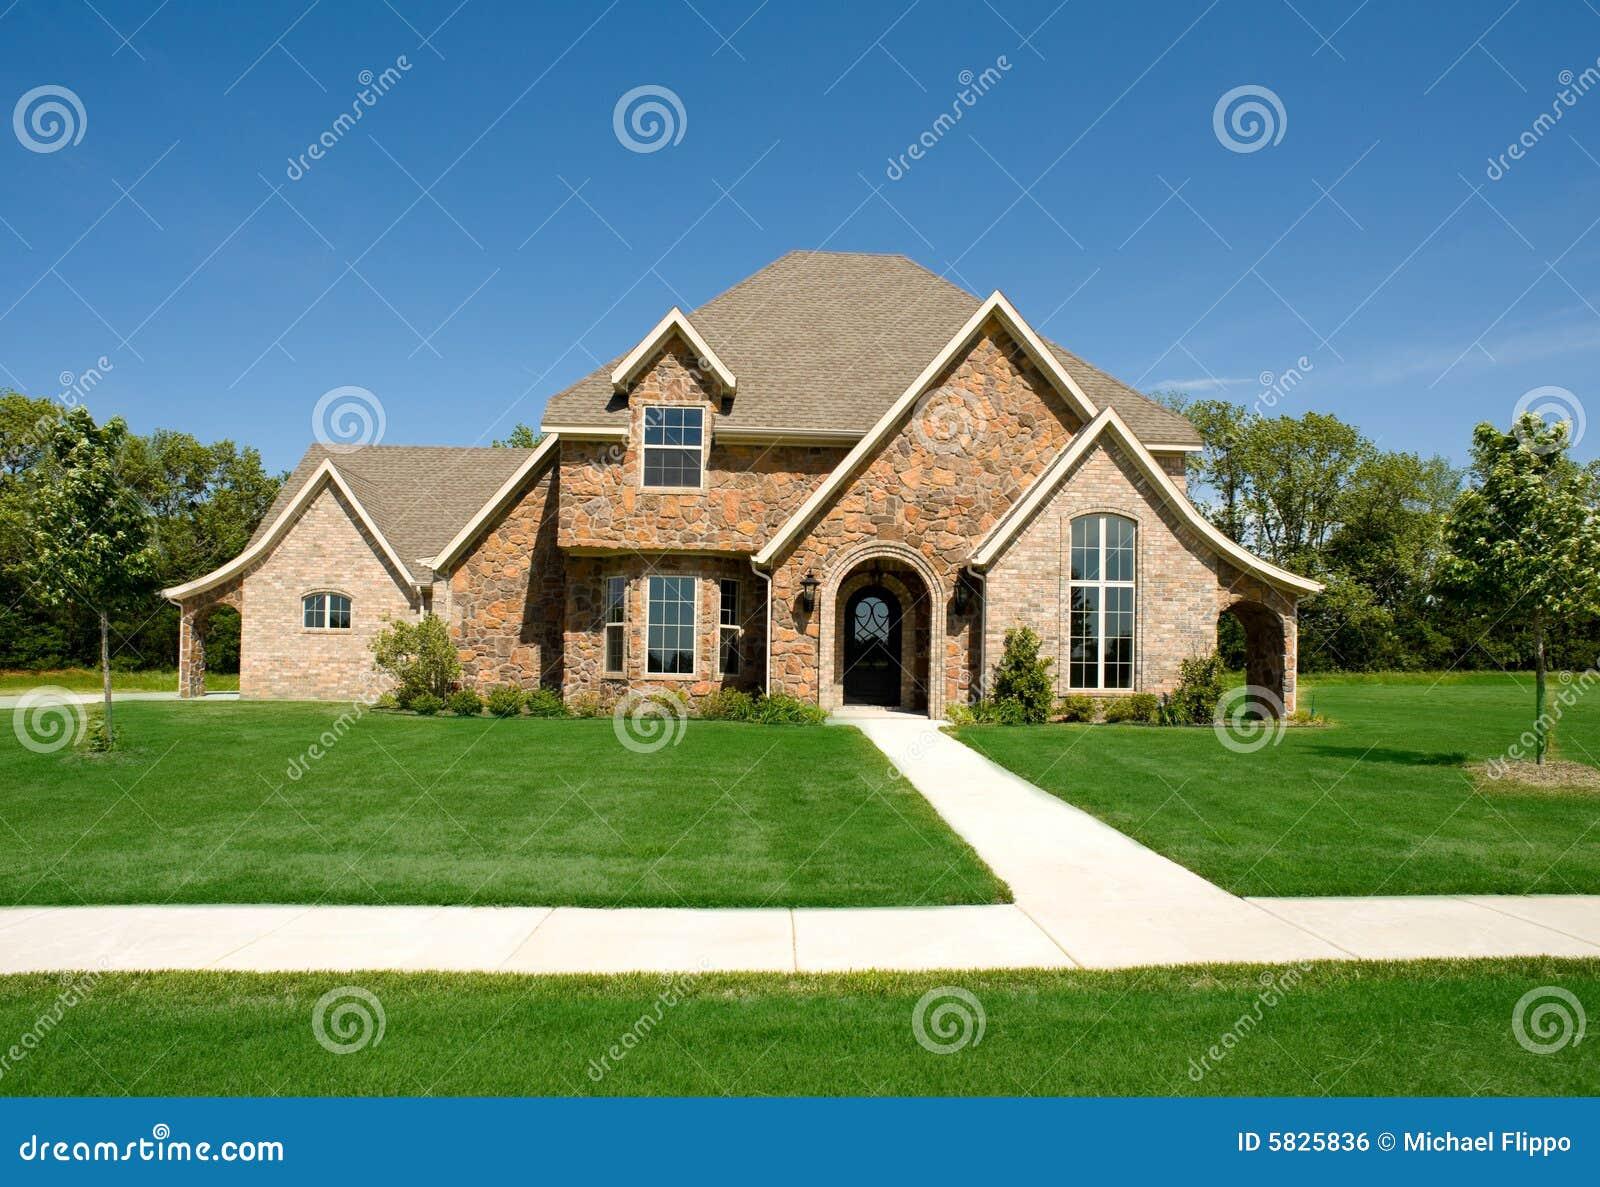 Mooi huis of huis stock foto afbeelding bestaande uit investeer 5825836 - Mooie huis foto ...